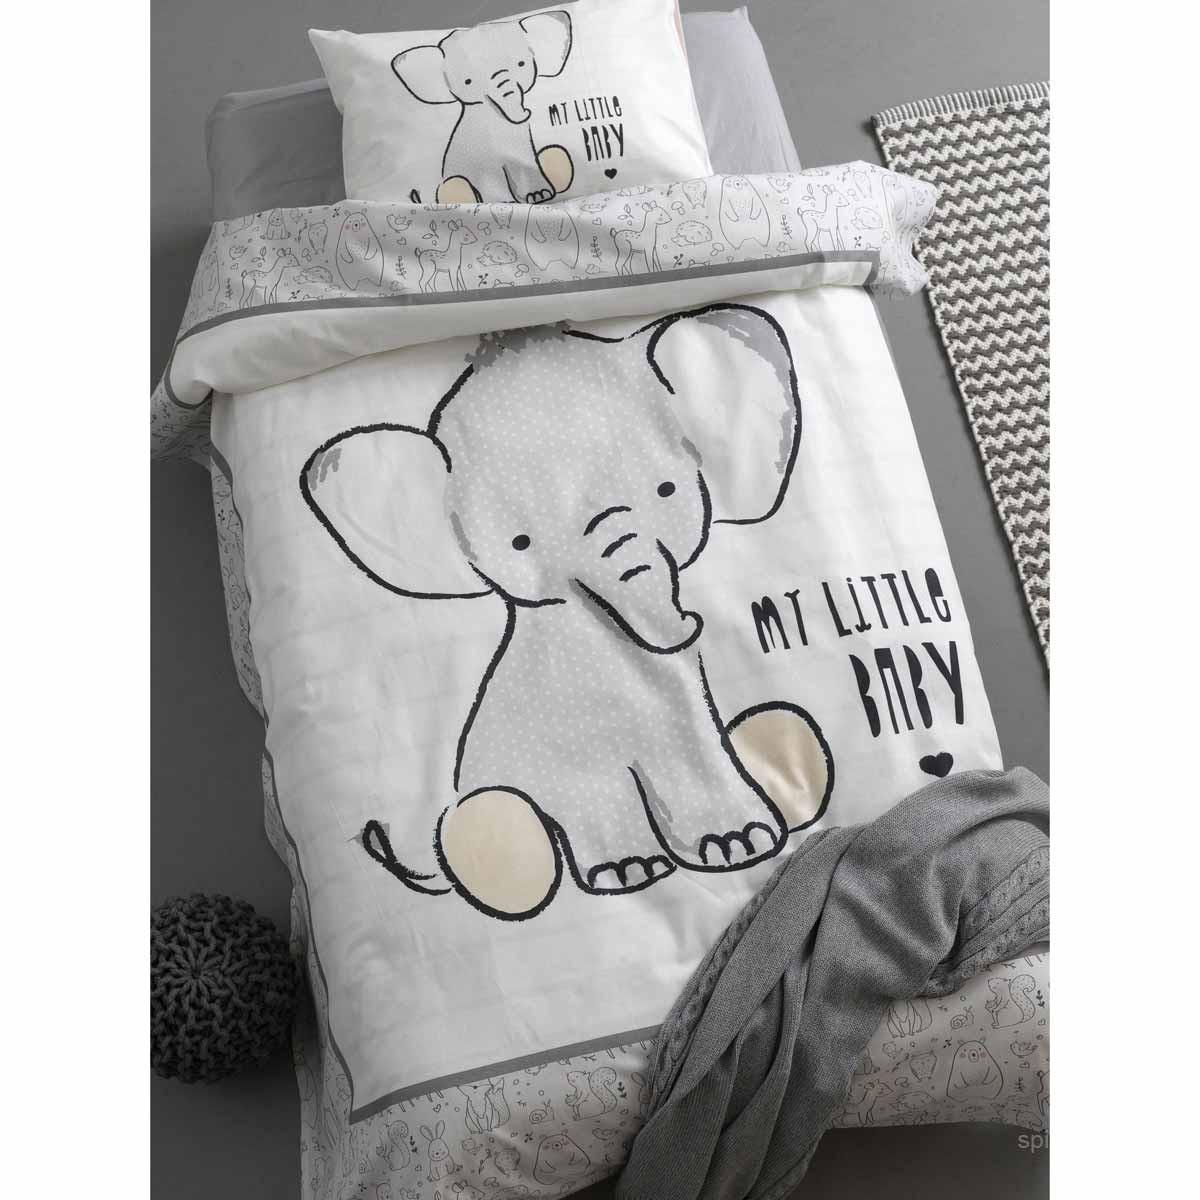 907e8163729 -10% Spiti Shop Σεντόνια Κούνιας (Σετ) Palamaiki Happy Baby 0552